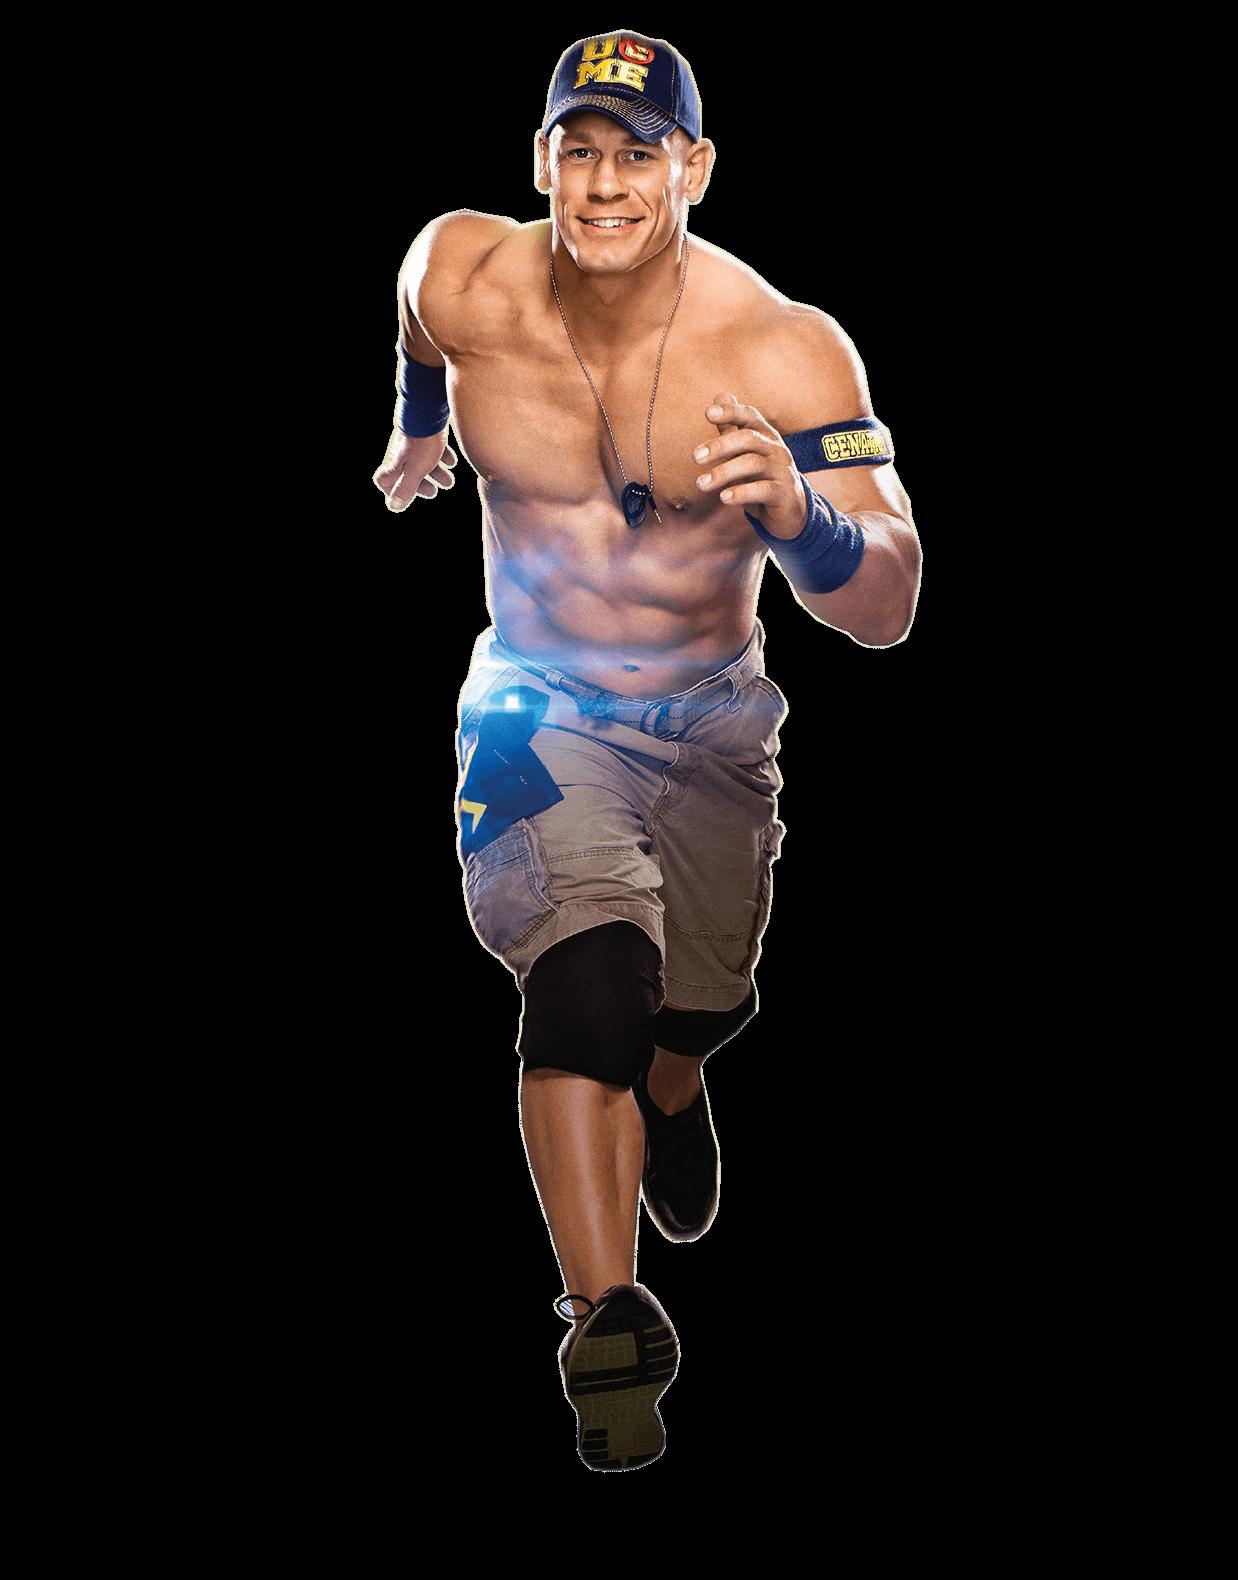 John Cena Running Fast transparent PNG.